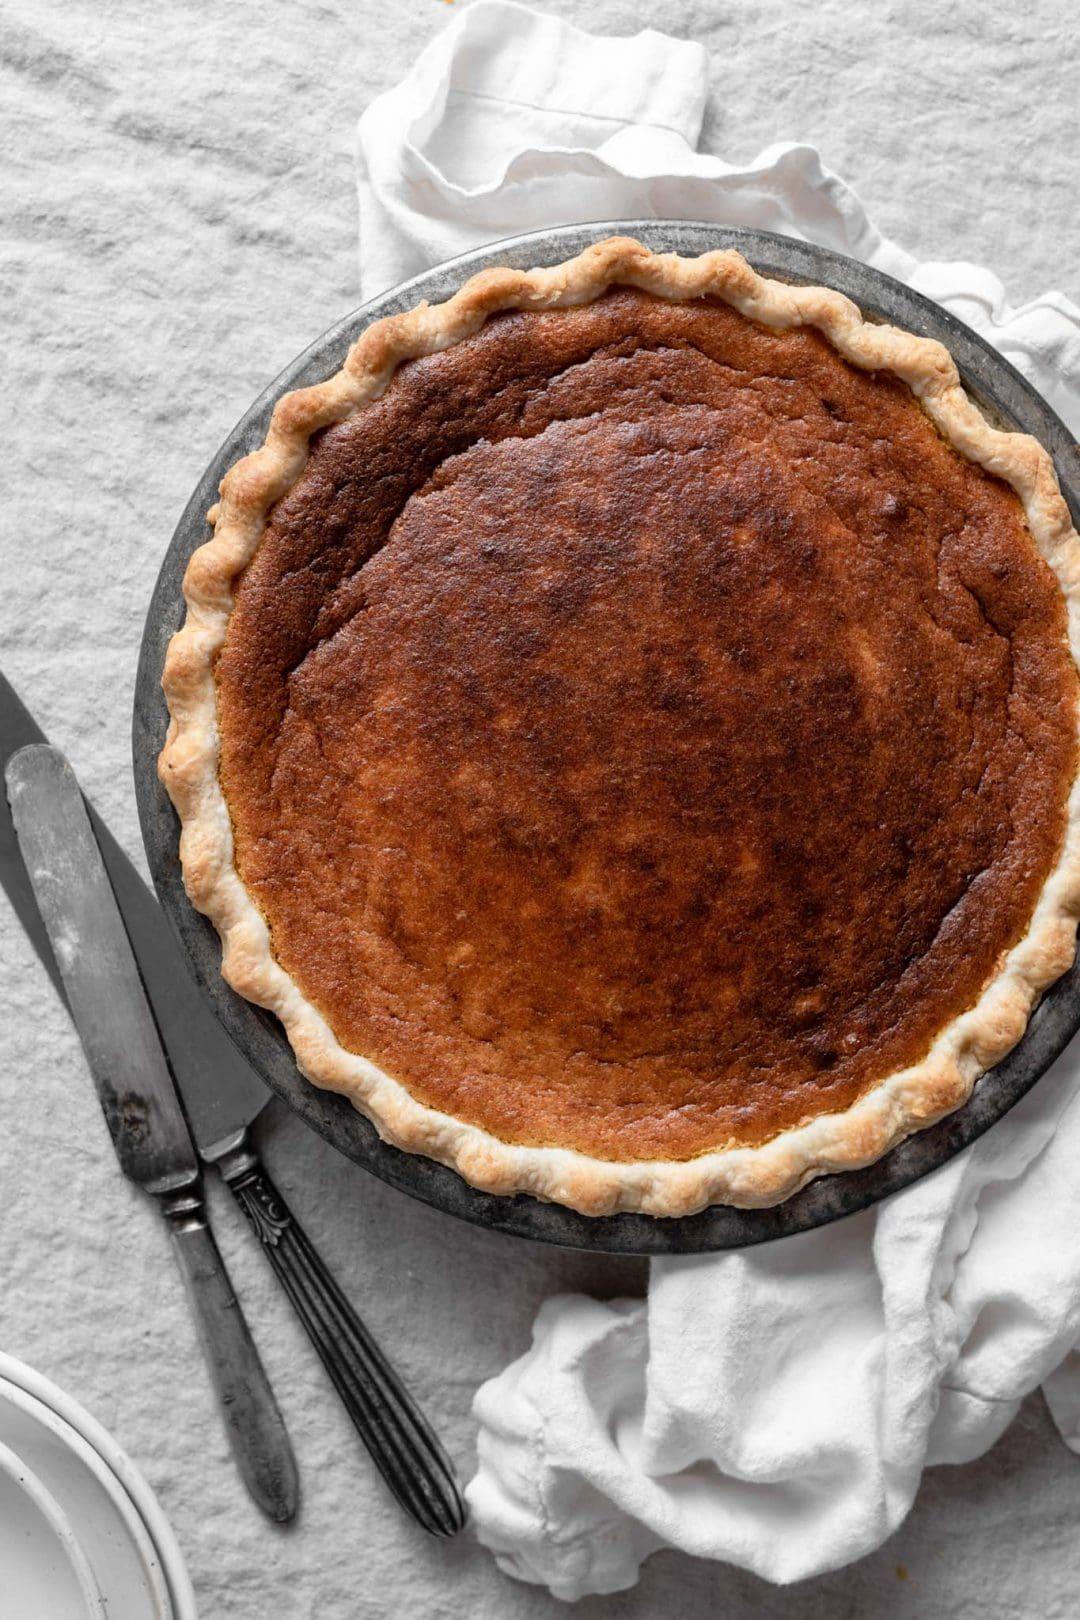 Homemade Pumpkin Pie with fresh pumpkin puree